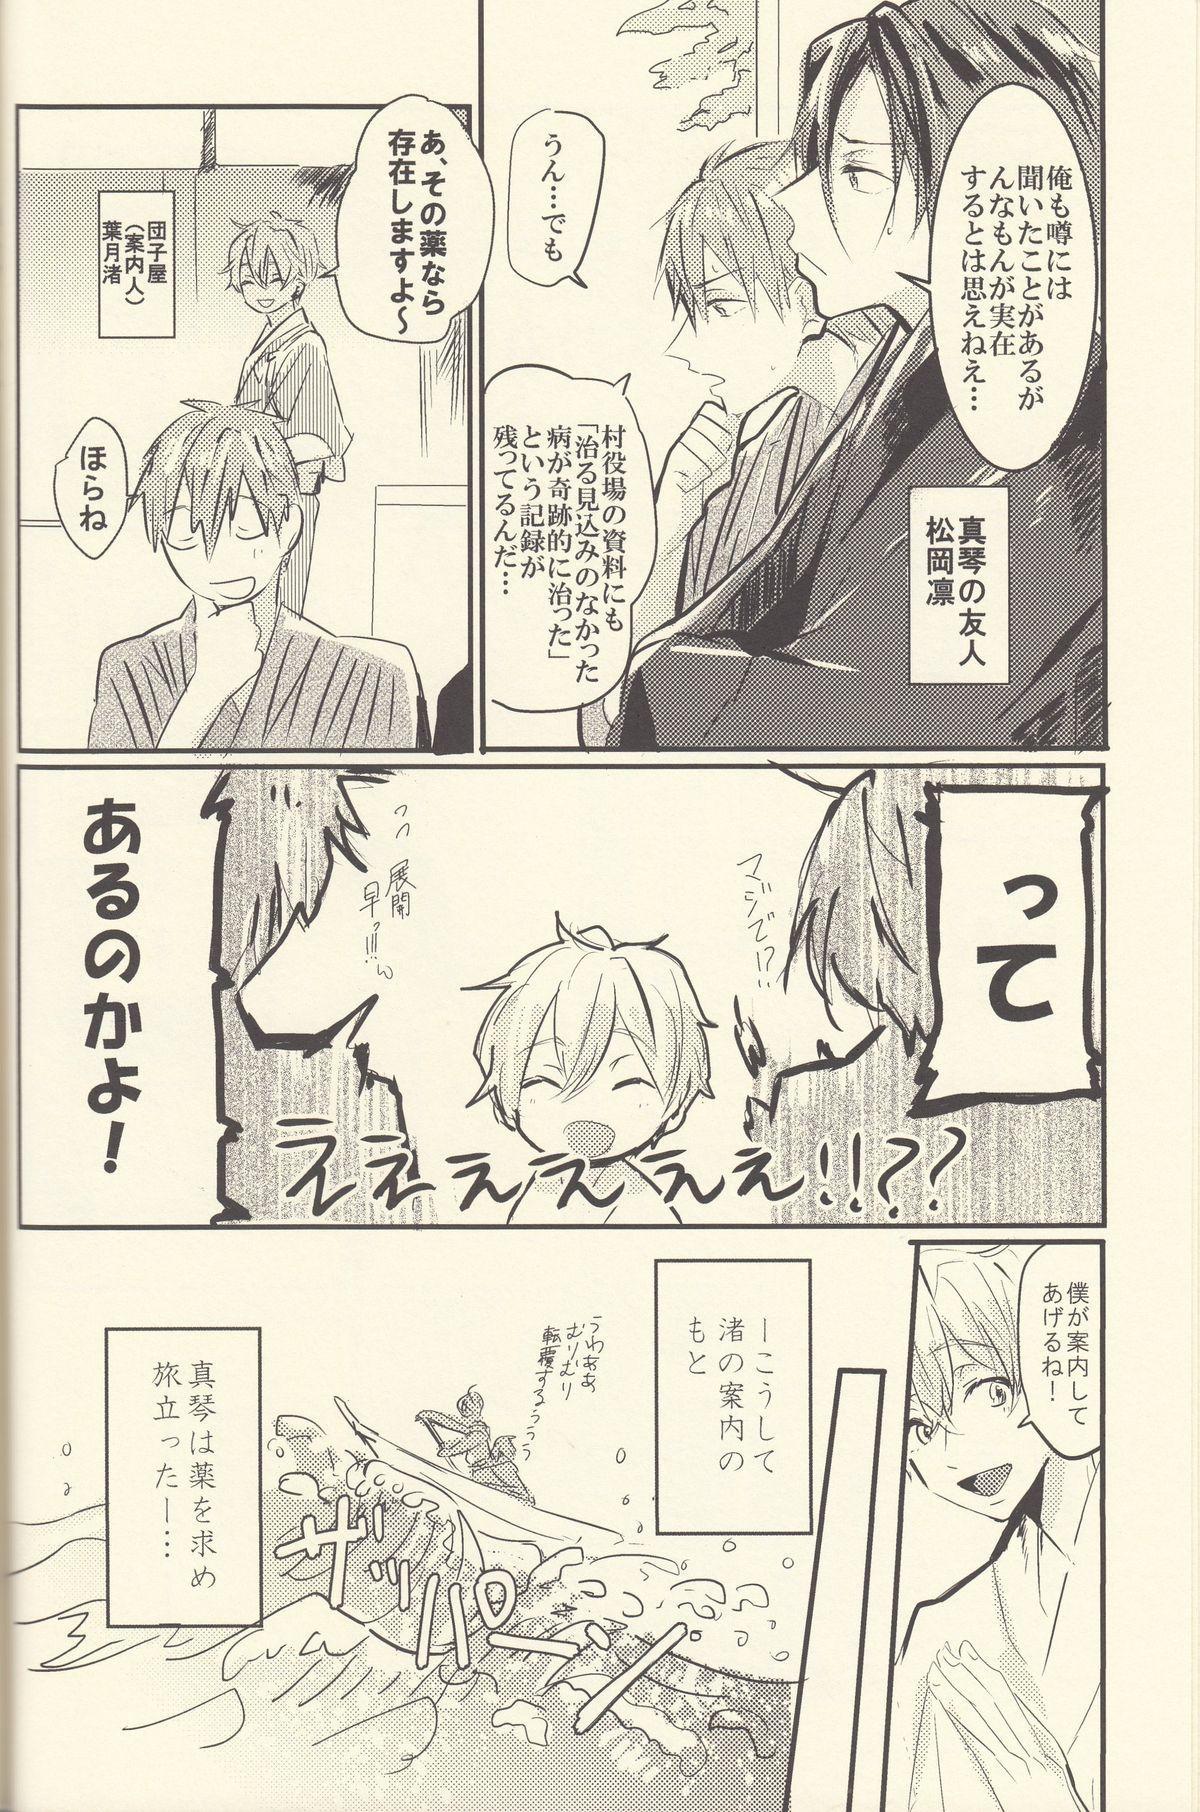 Shiofuki no Friendship - Makoto ♥ Haruka Squirting Anthology 15